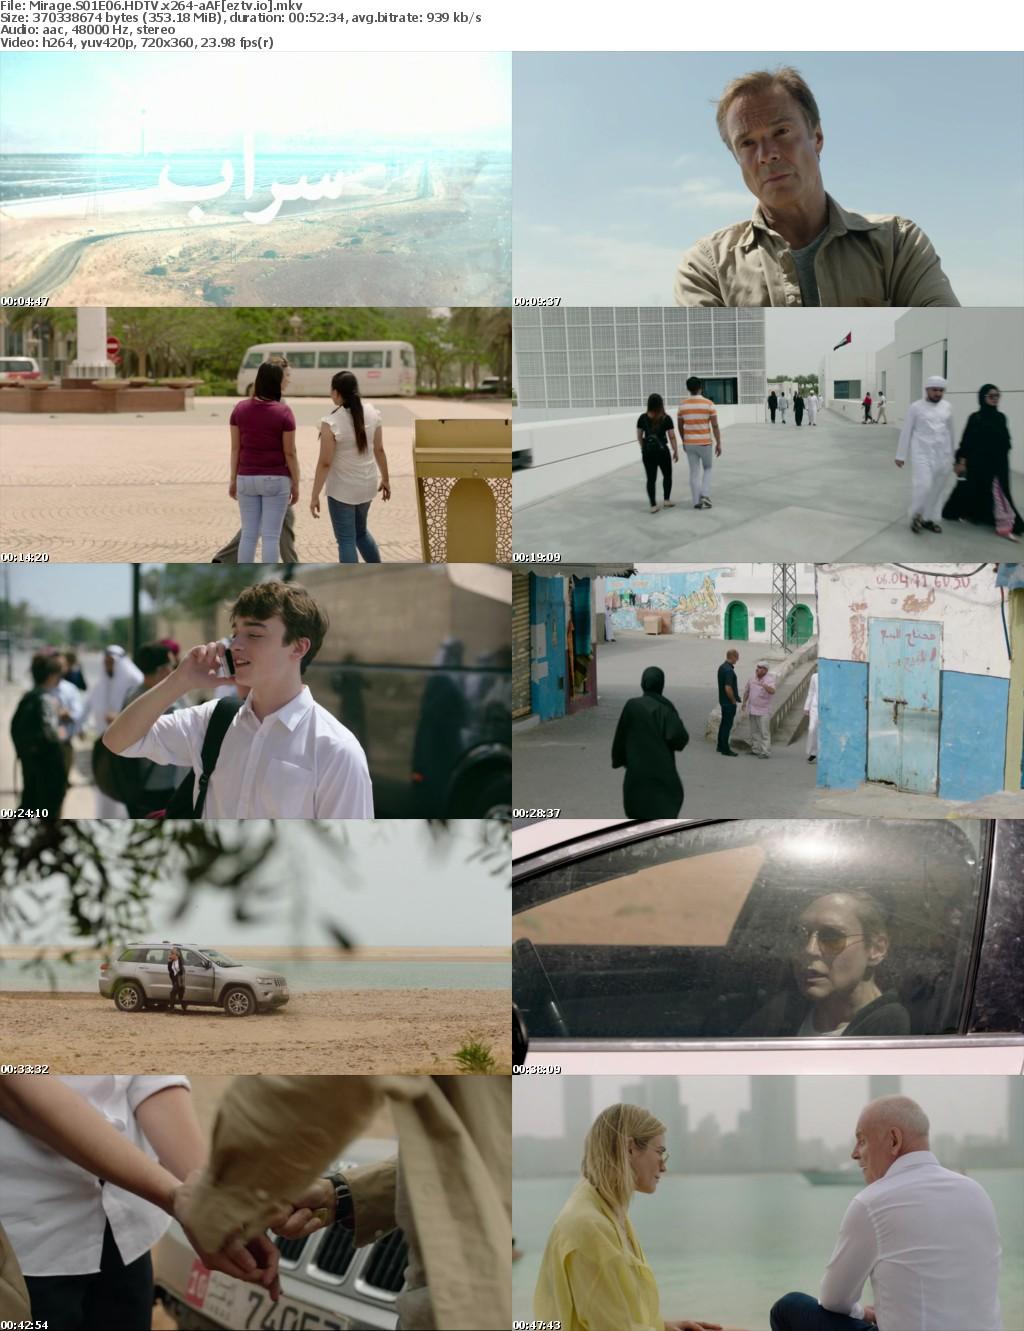 Mirage S01E06 HDTV x264-aAF